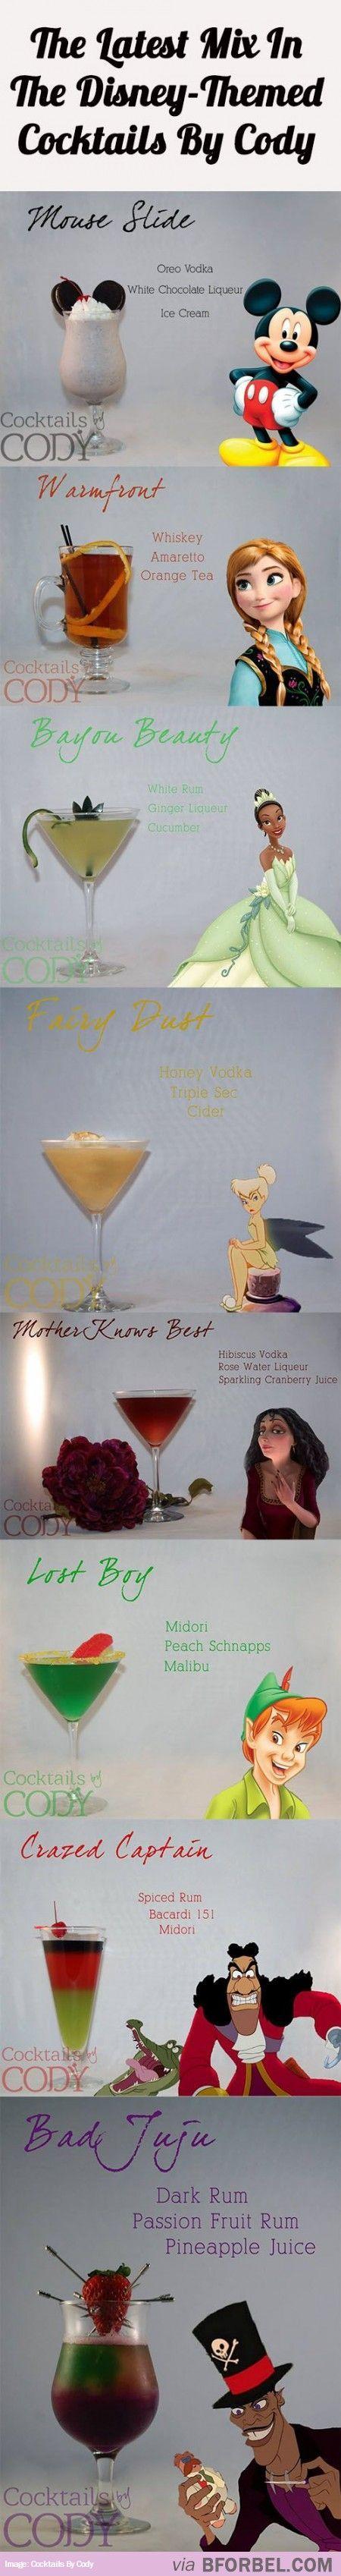 56_(Theme Party) 以美酒點綴派對 -  迪士尼的狂歡世界02